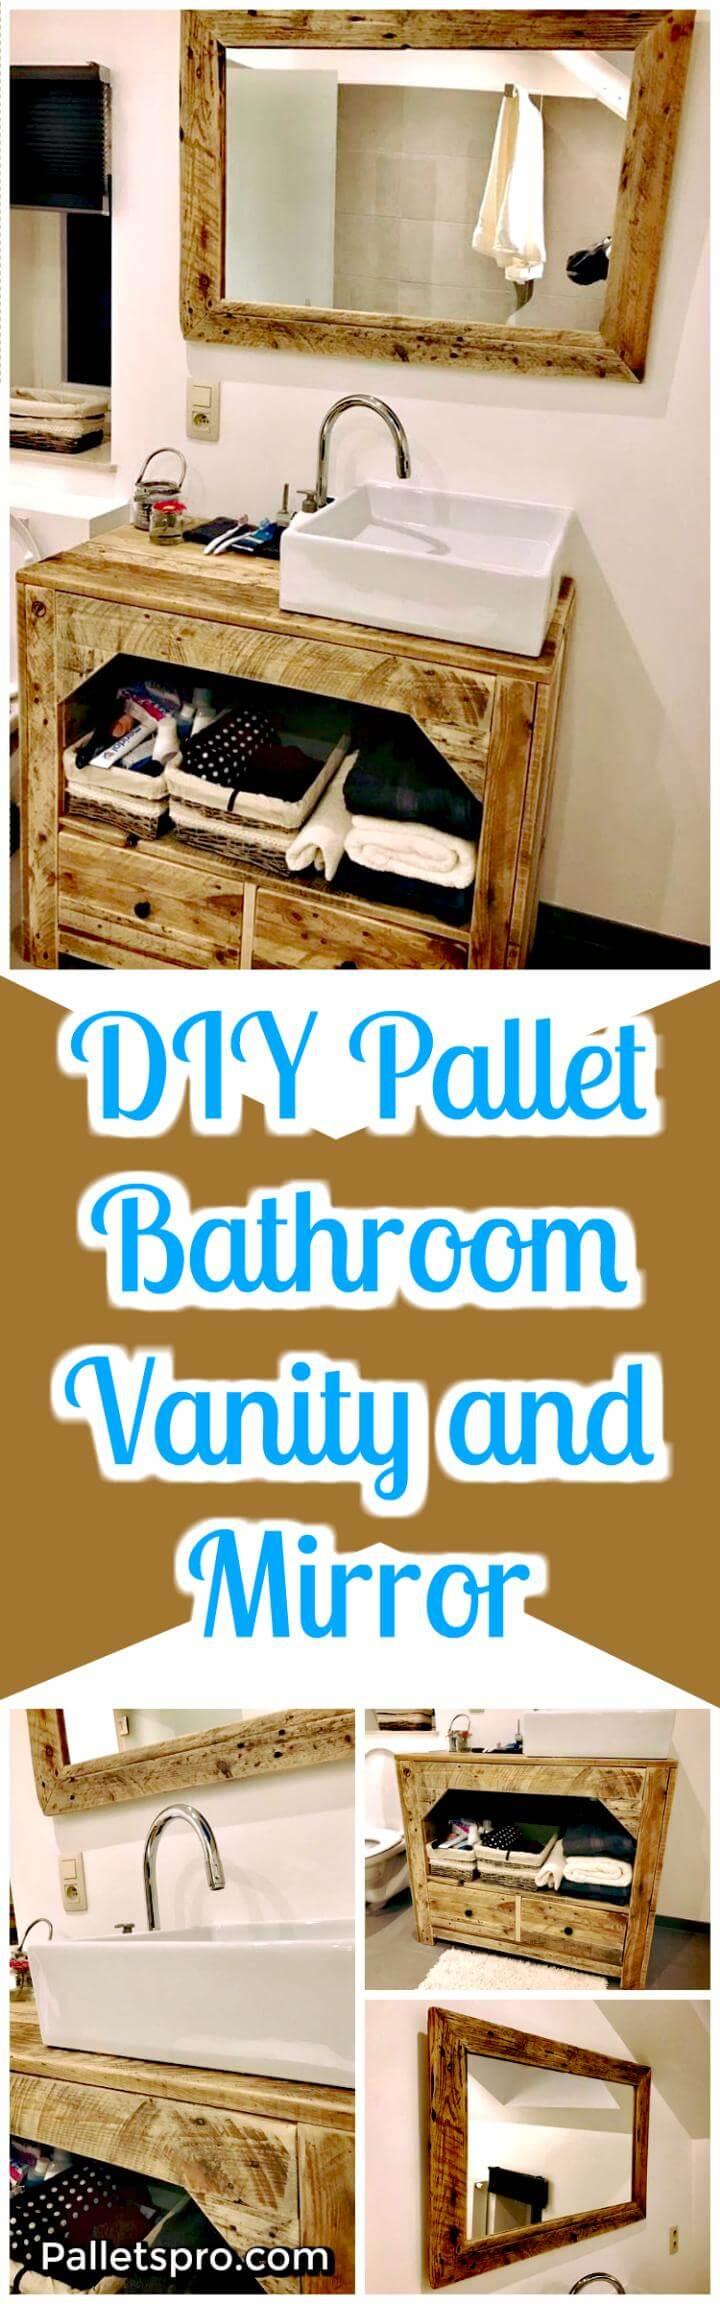 Pallet Bathroom Vanity and Mirror